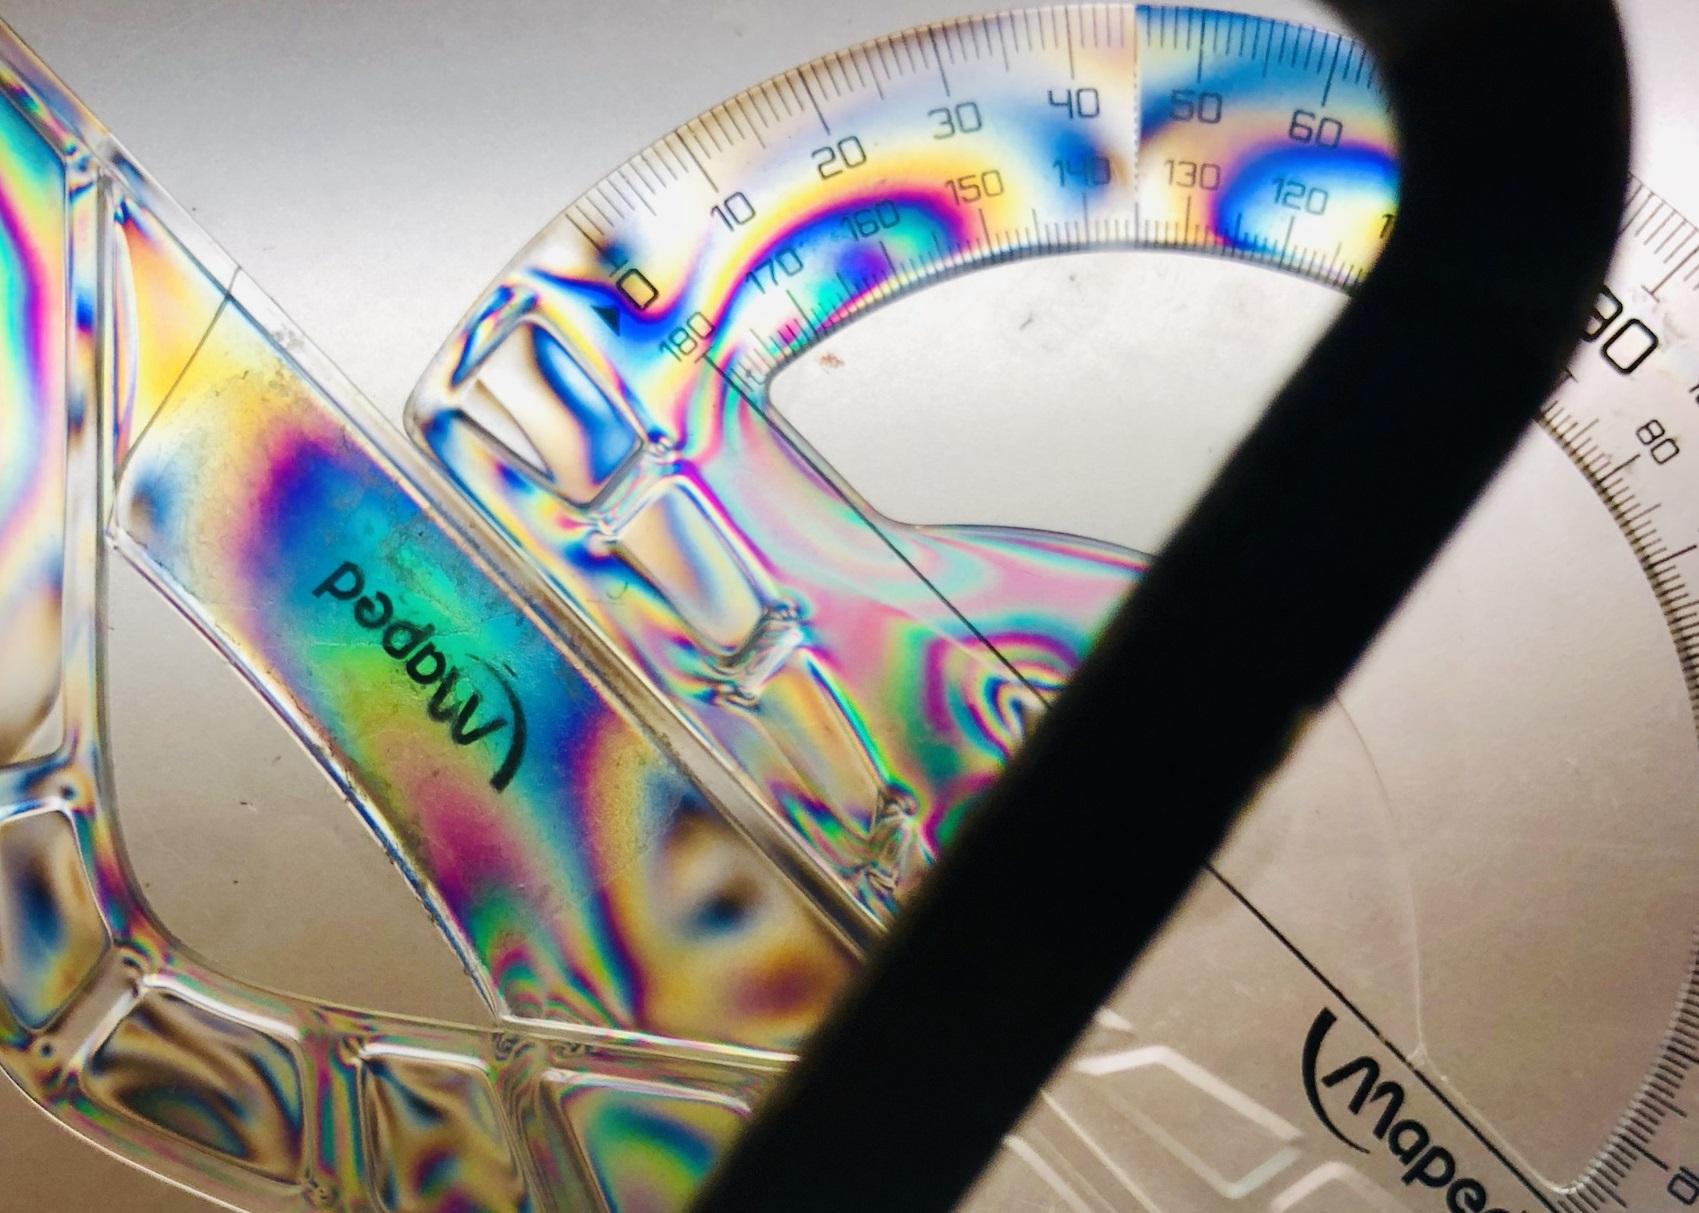 Фотоэкскурсия: Музей оптики Университета ИТМО - 21